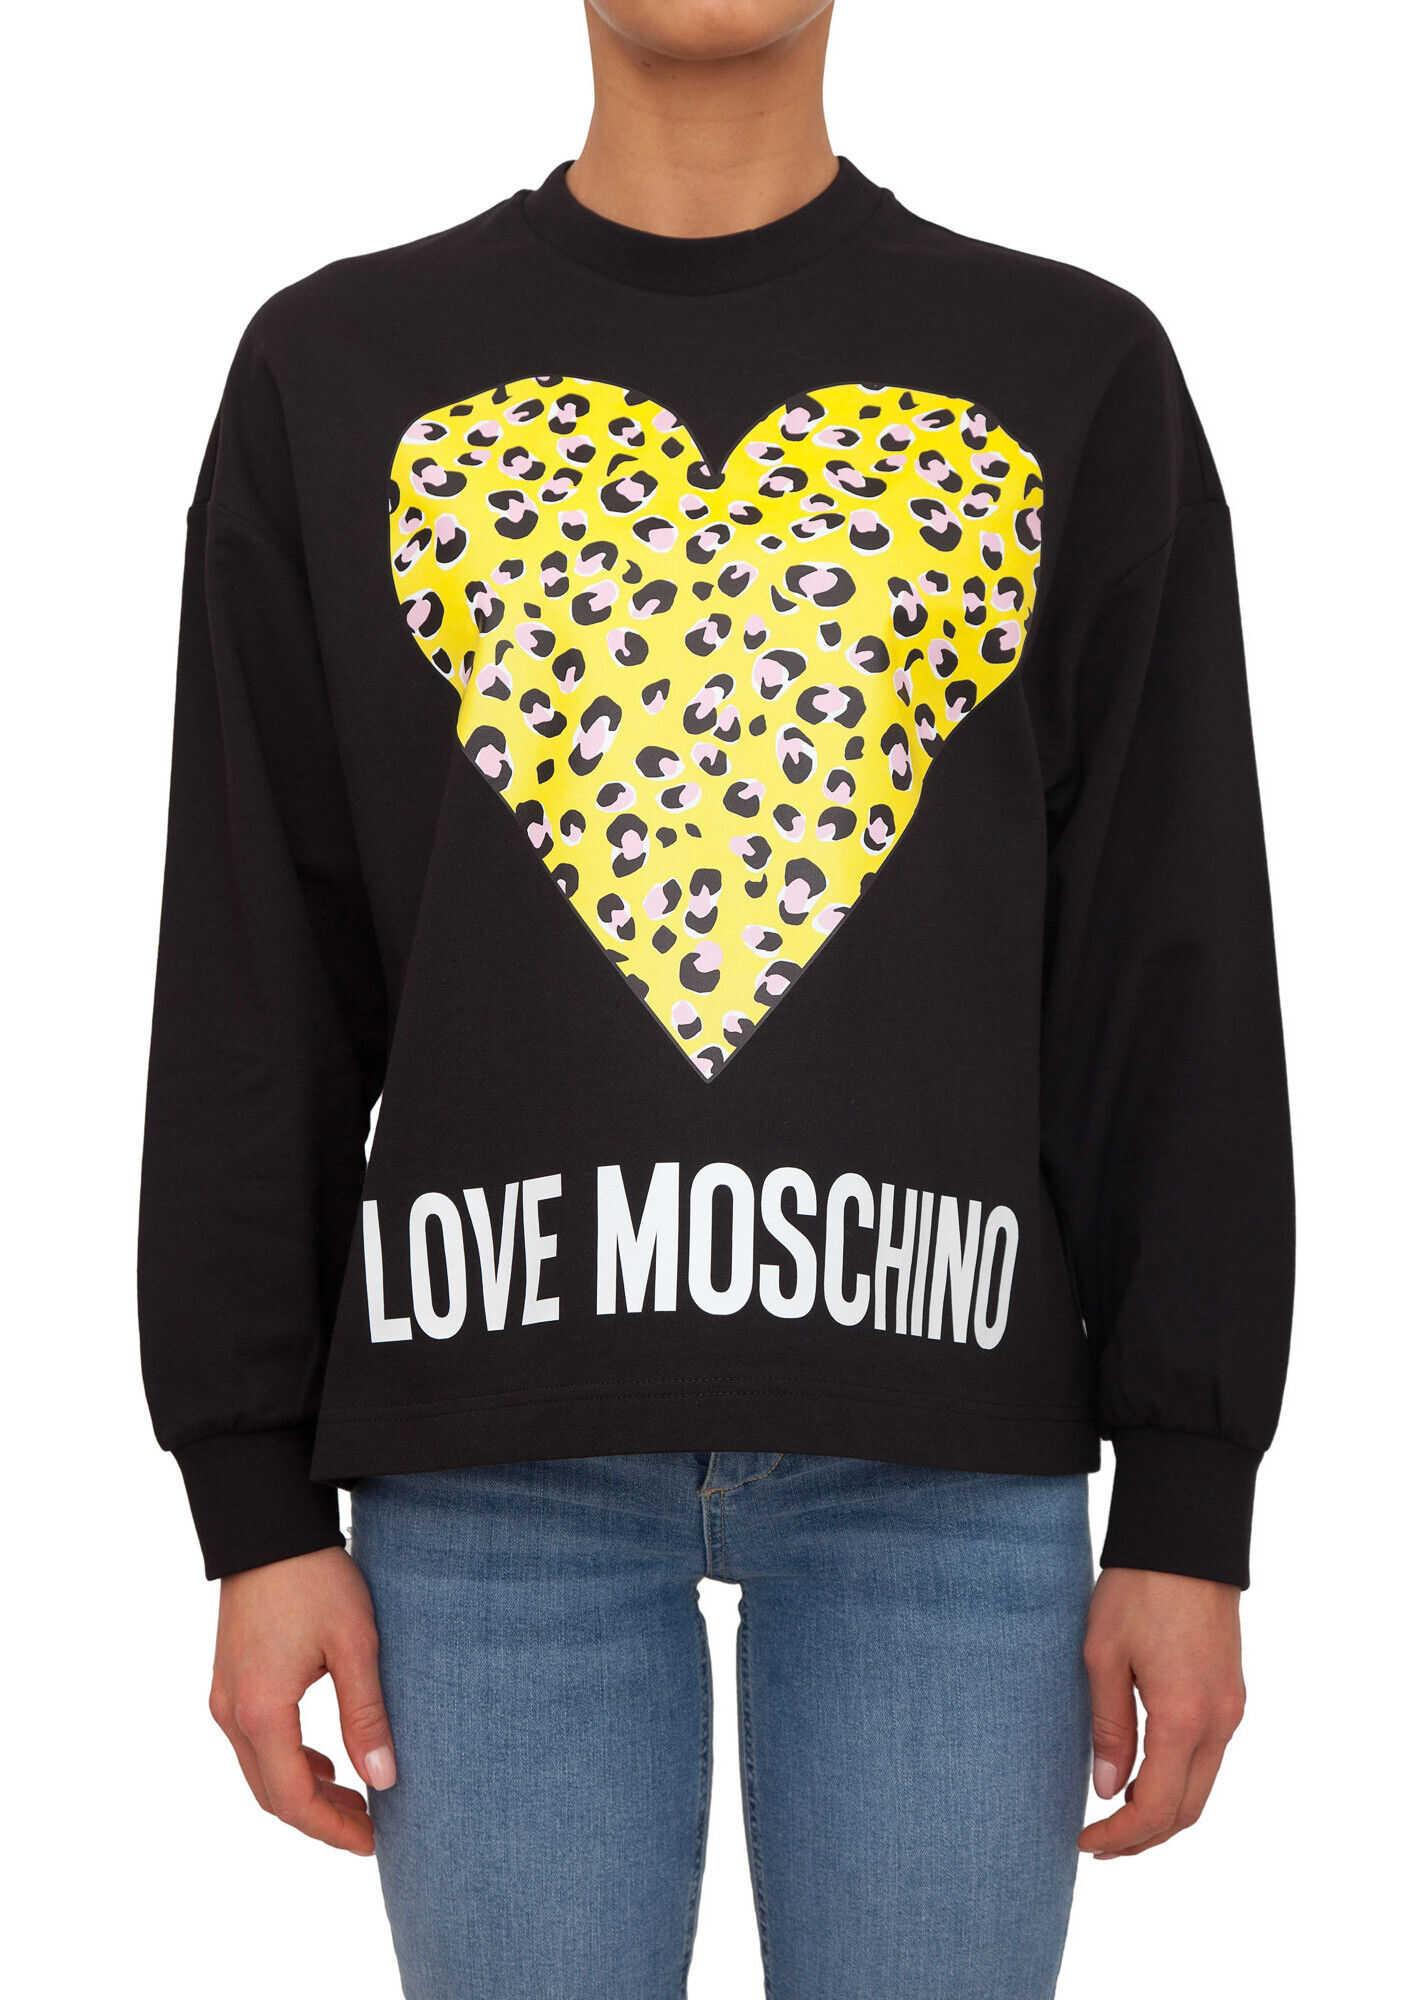 LOVE Moschino 38BD765F BLACK